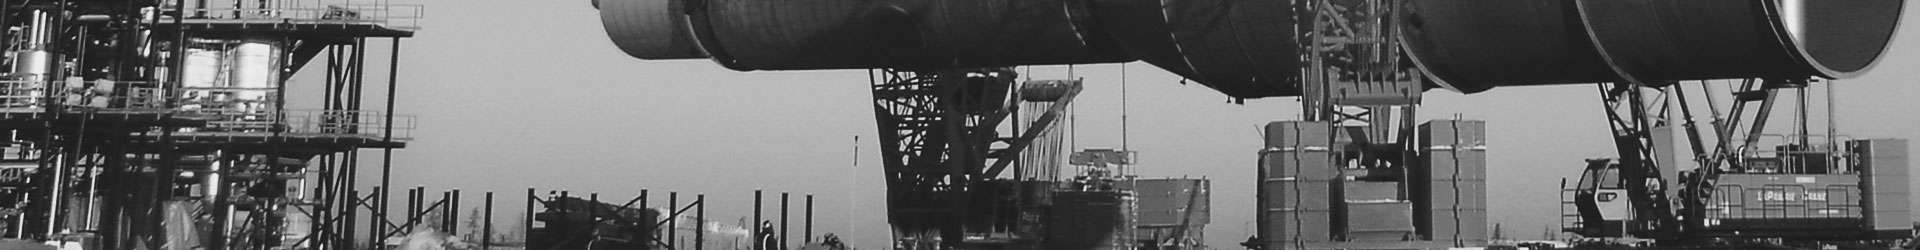 crane rental calgary alberta